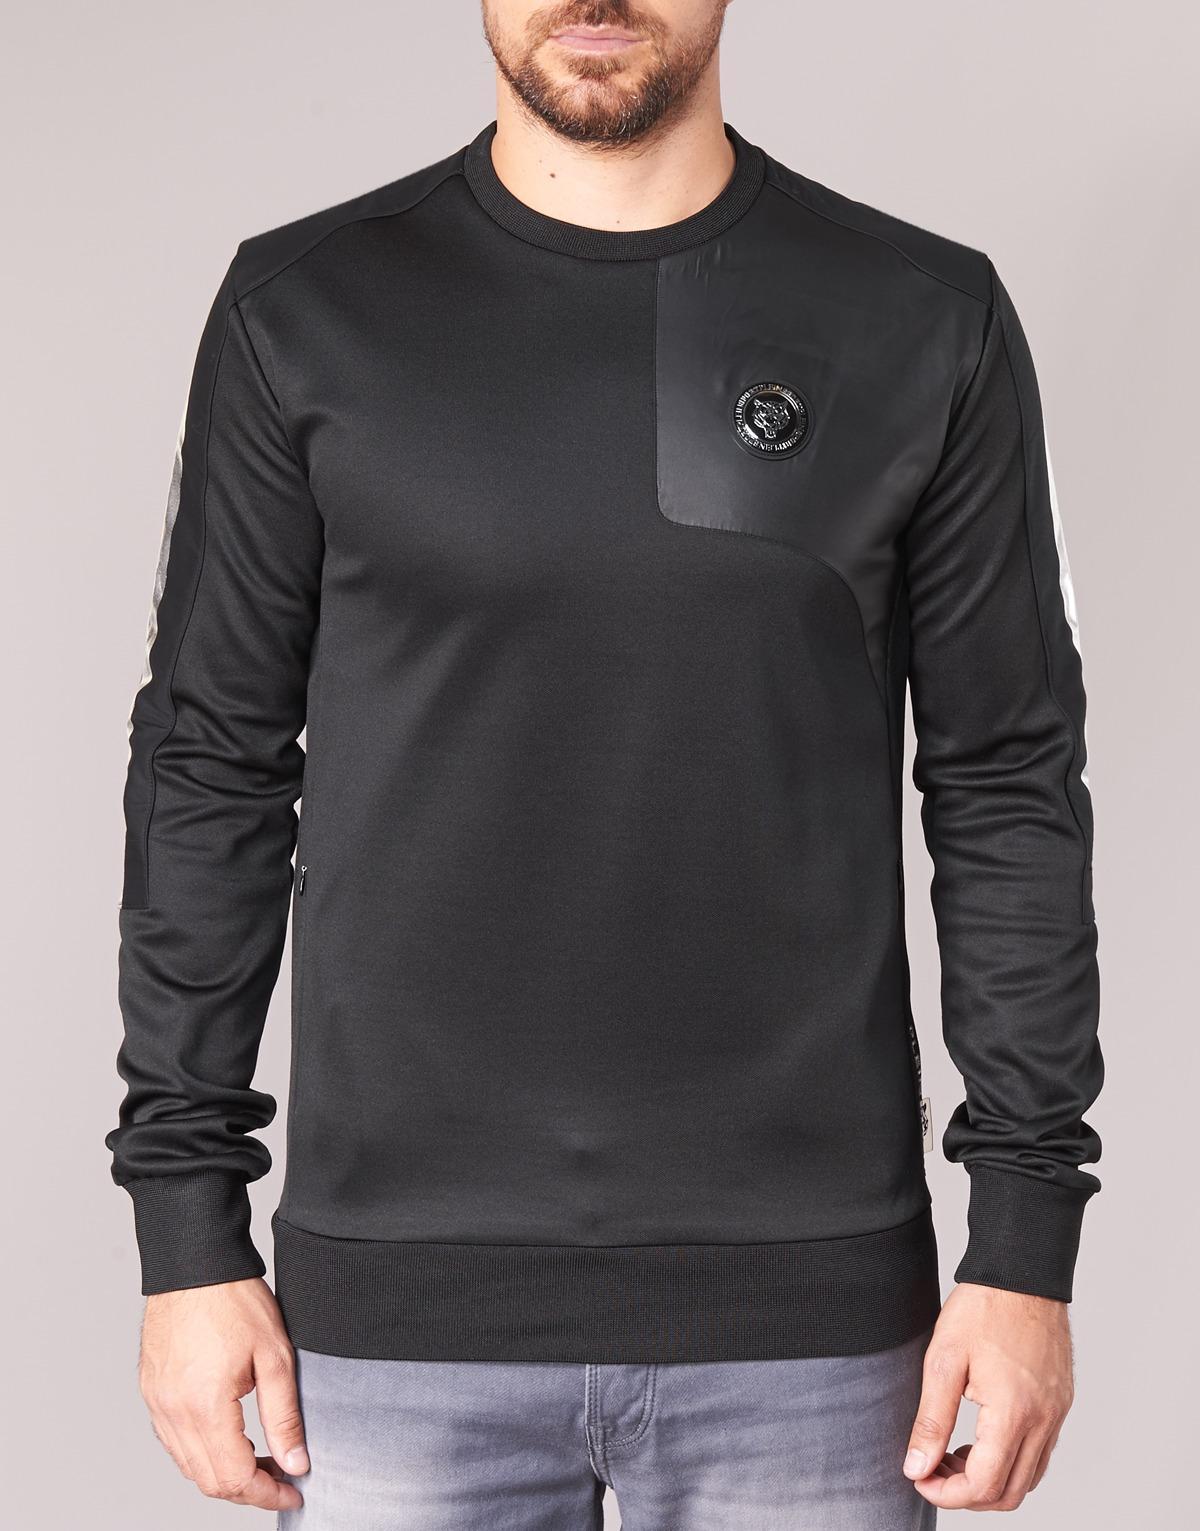 Philipp Plein Black Version Sweatshirt for Men